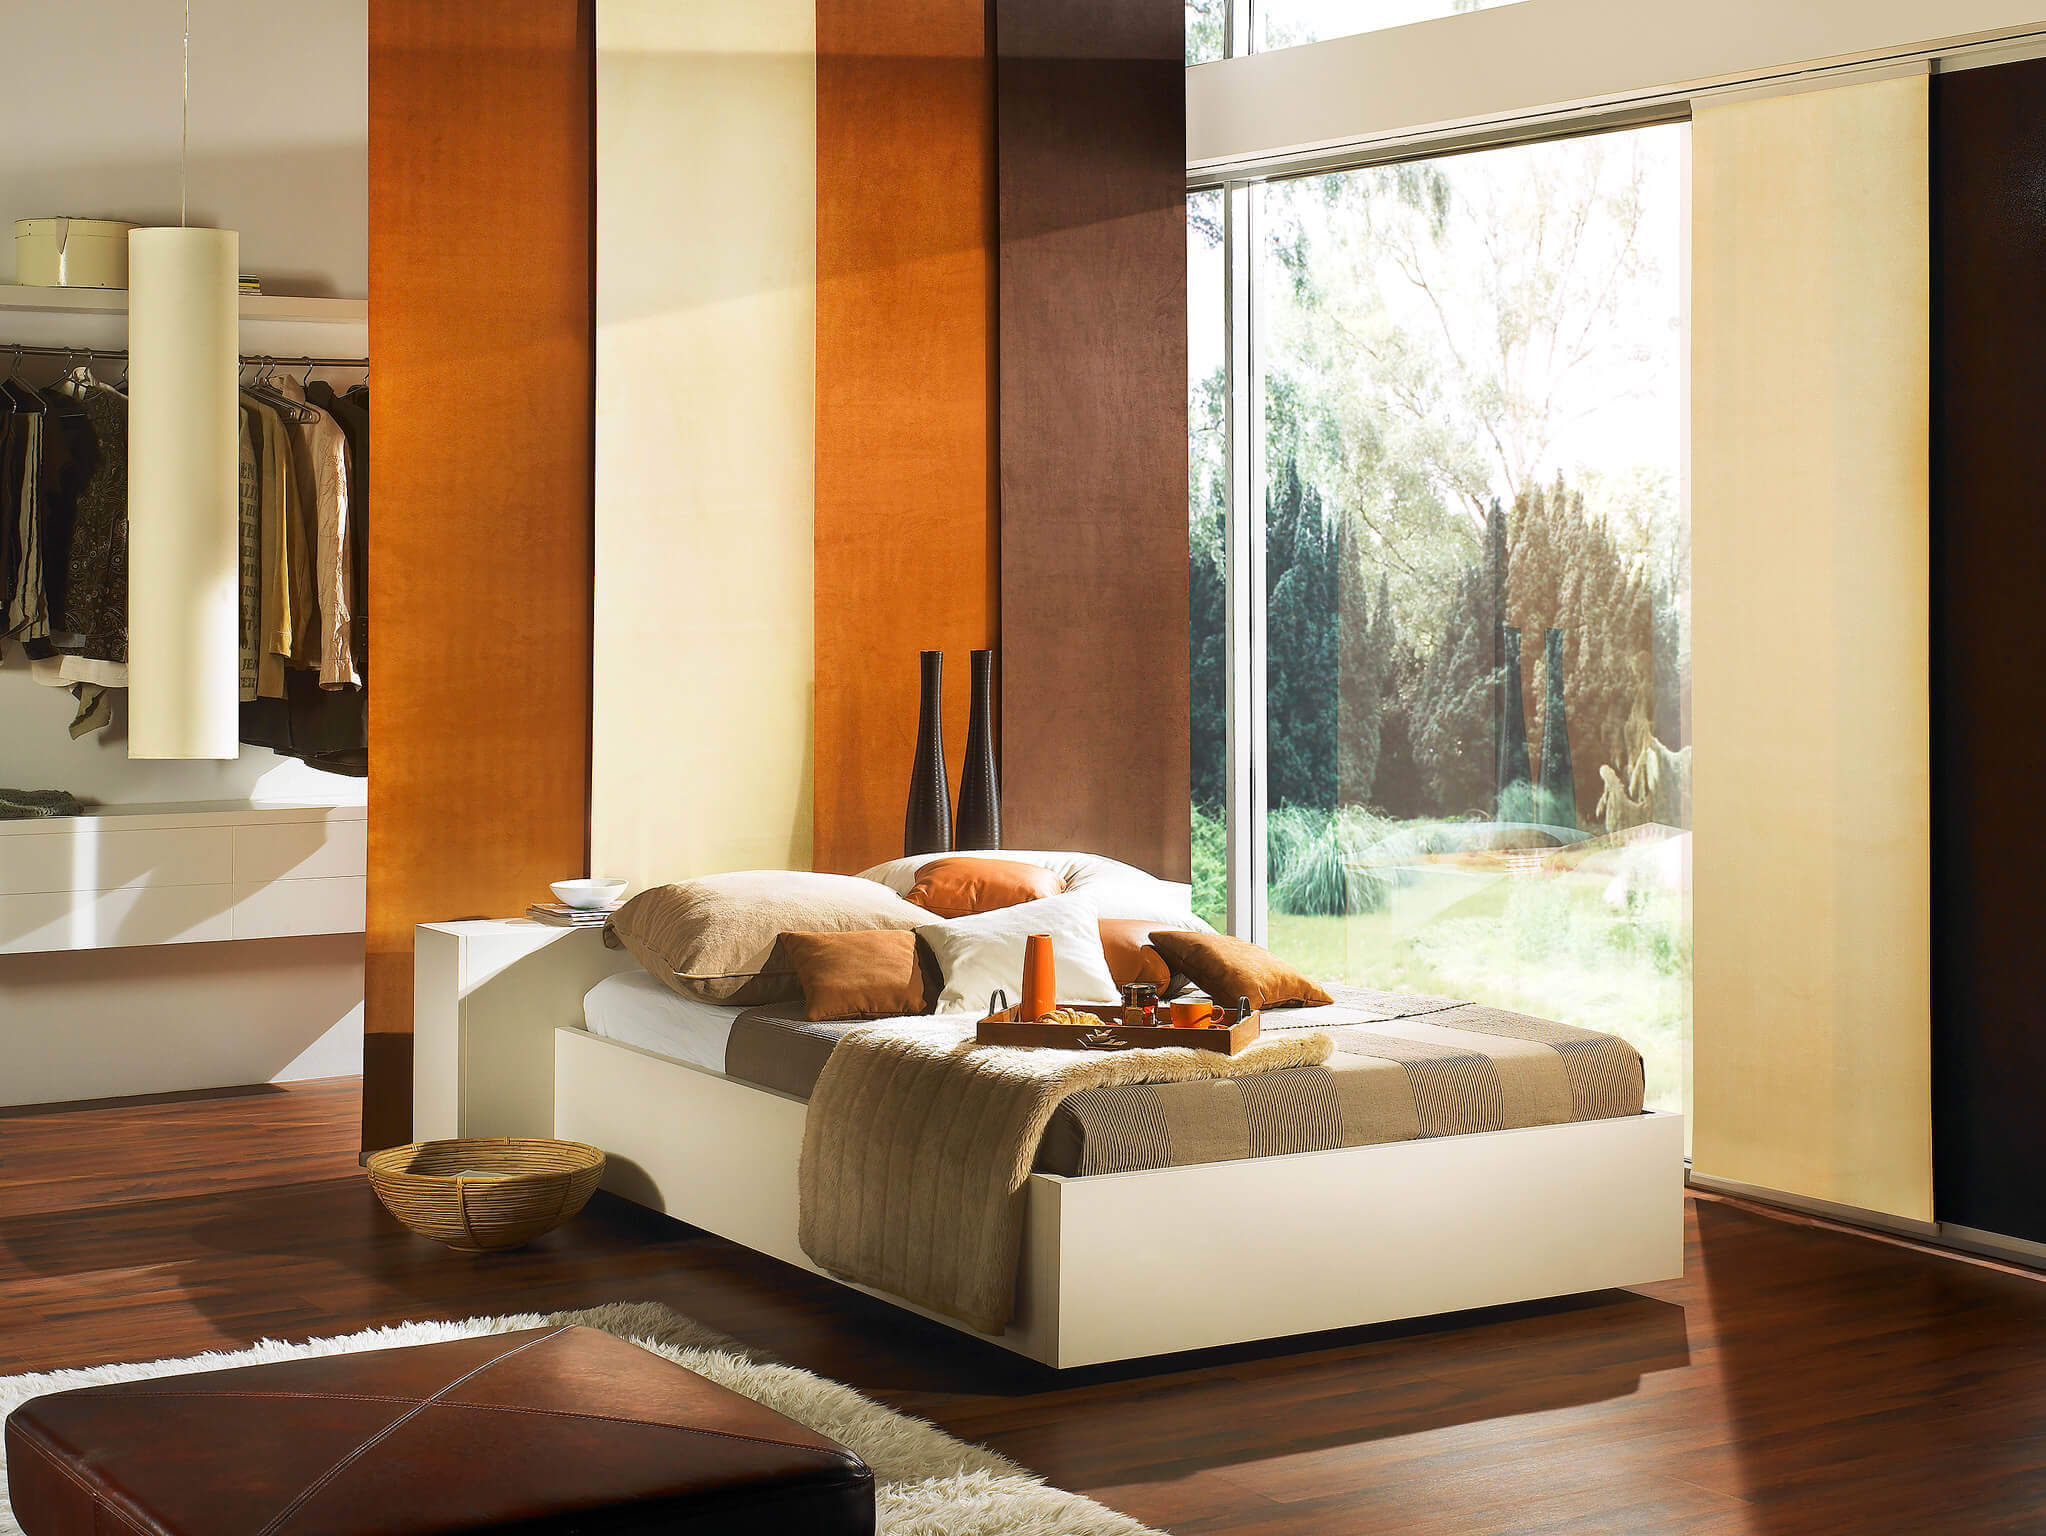 fl chenvorh nge raumteiler und fensterdekoration. Black Bedroom Furniture Sets. Home Design Ideas